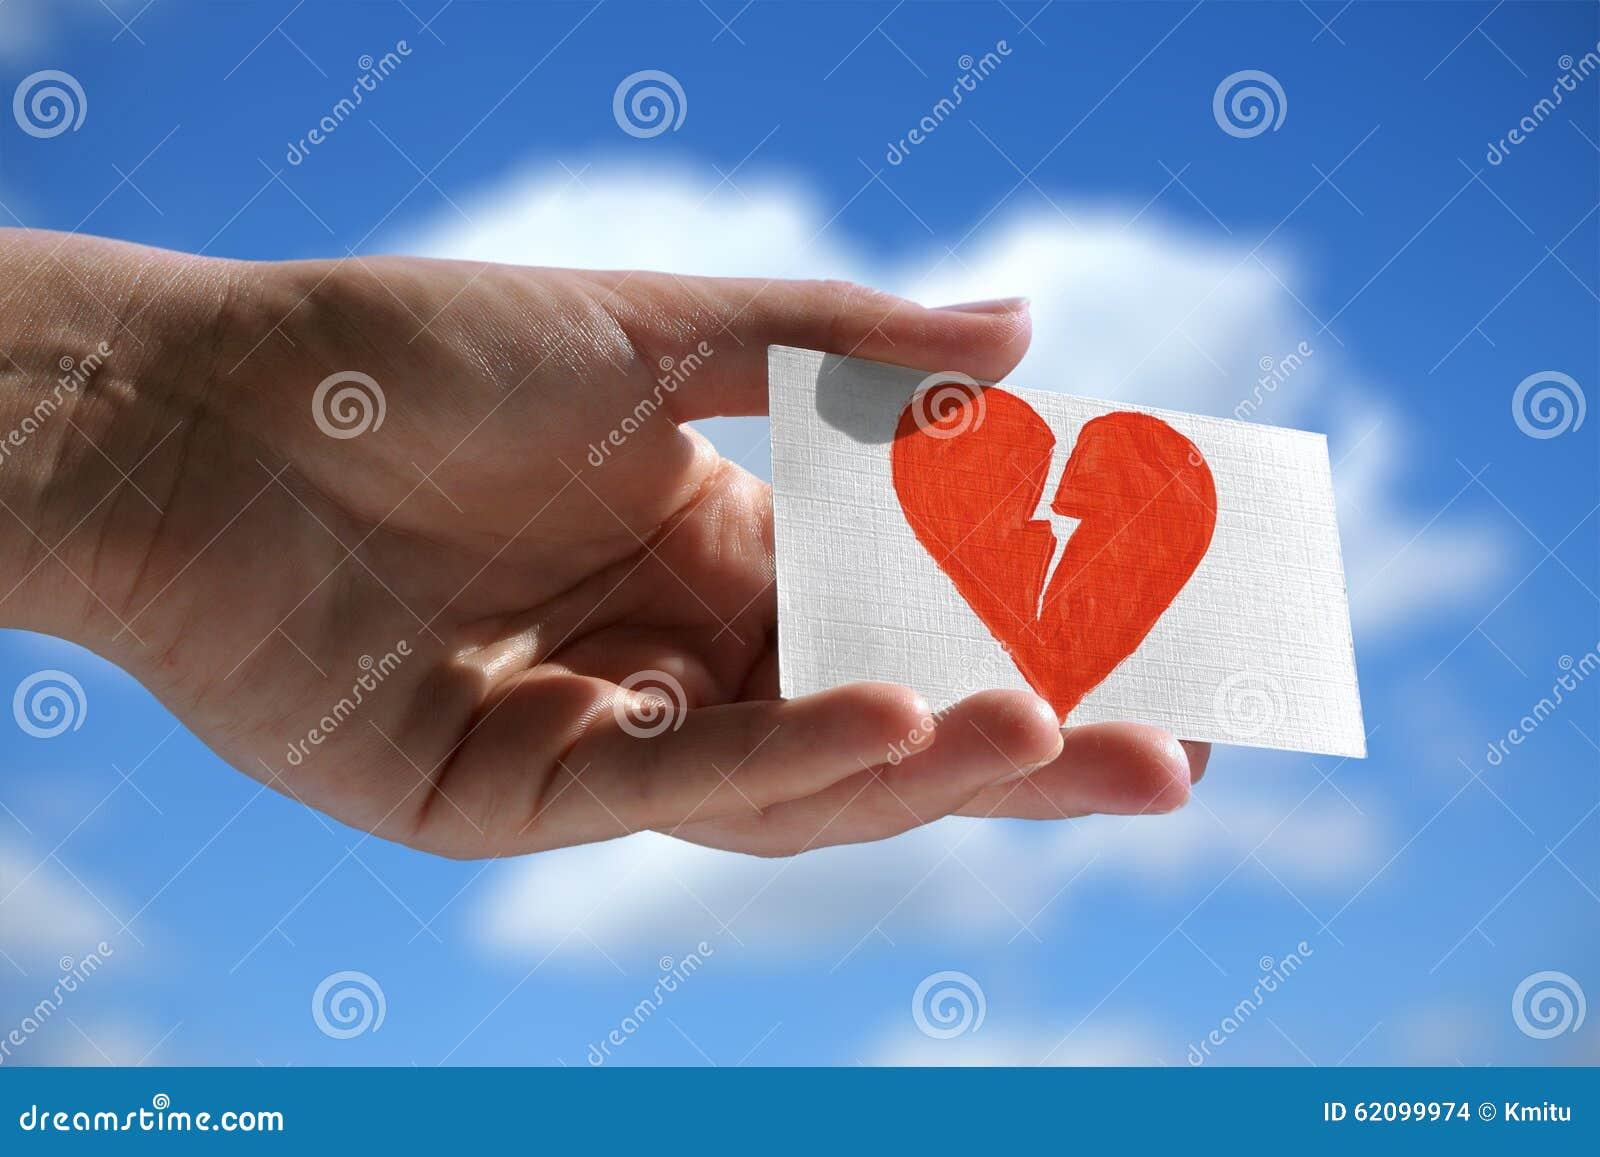 Symbol of broken heart stock photo image of divorce 62099974 symbol of broken heart buycottarizona